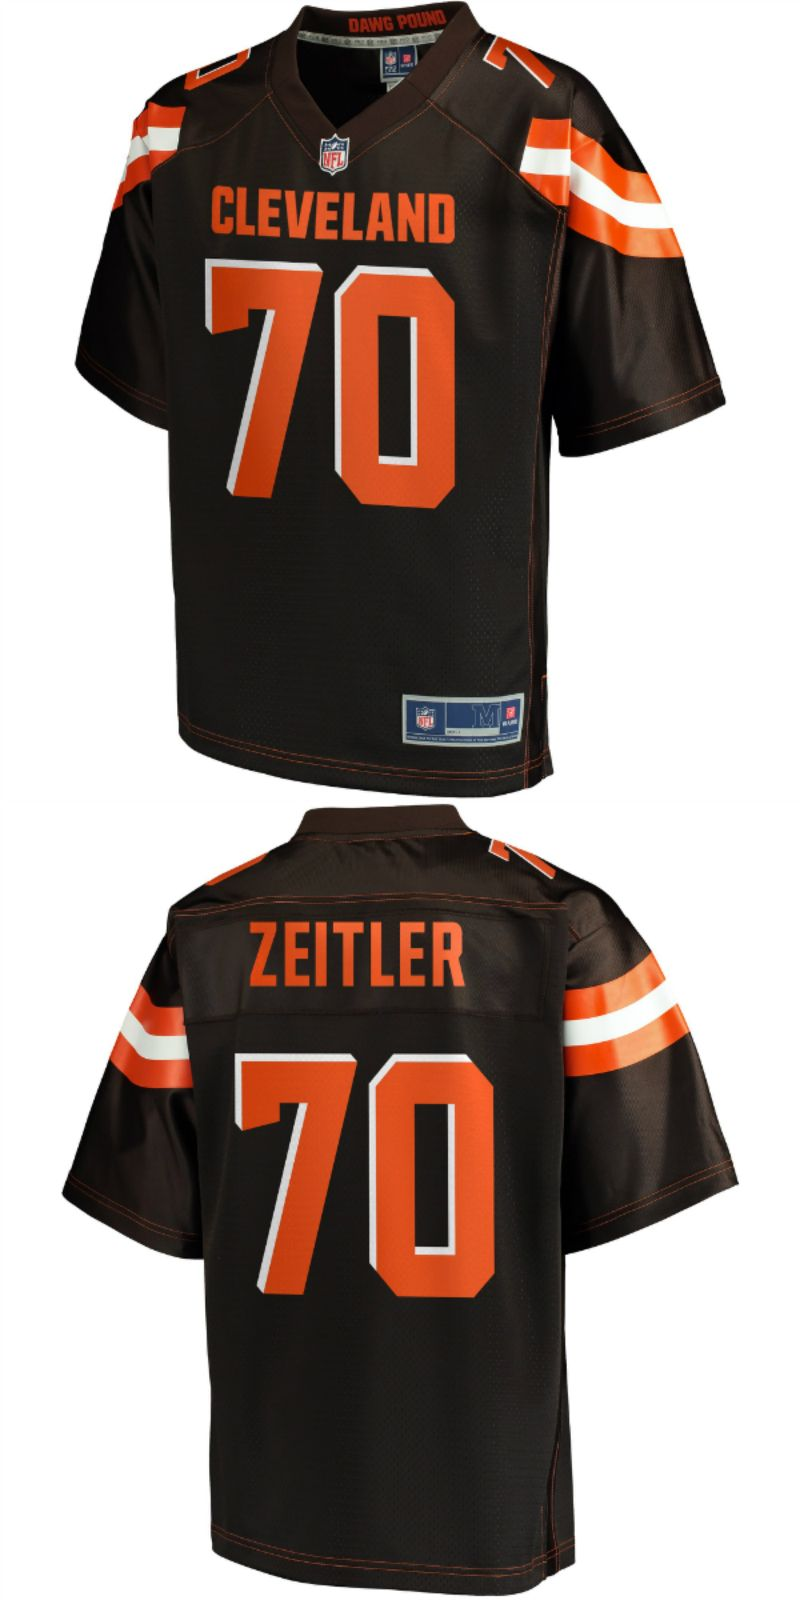 huge selection of bf5bc 52ac0 UP TO 70% OFF. Kevin Zeitler Cleveland Browns NFL Pro Line ...